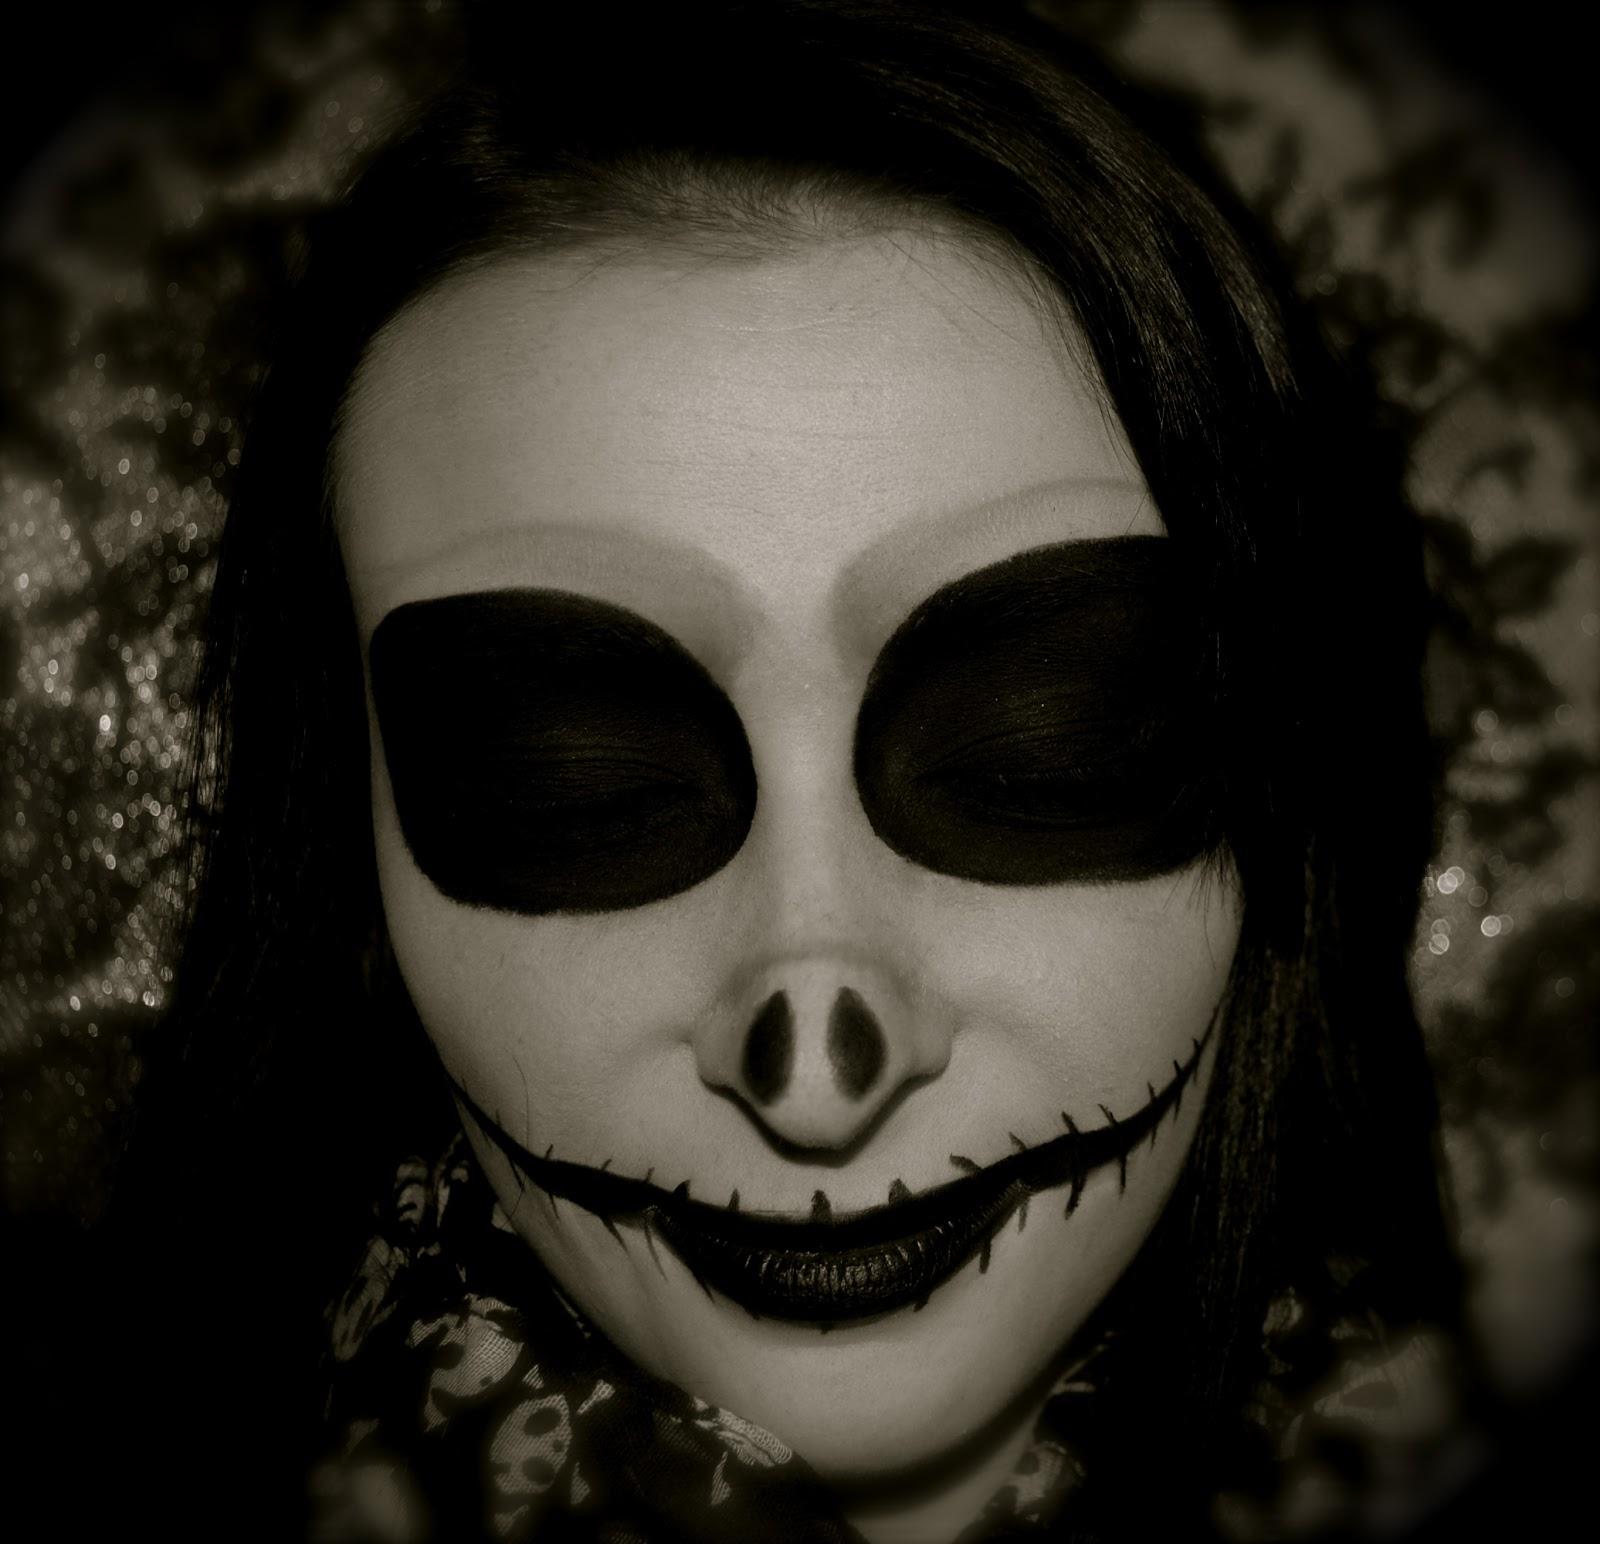 jack nightmare before christmas makeup - photo #19